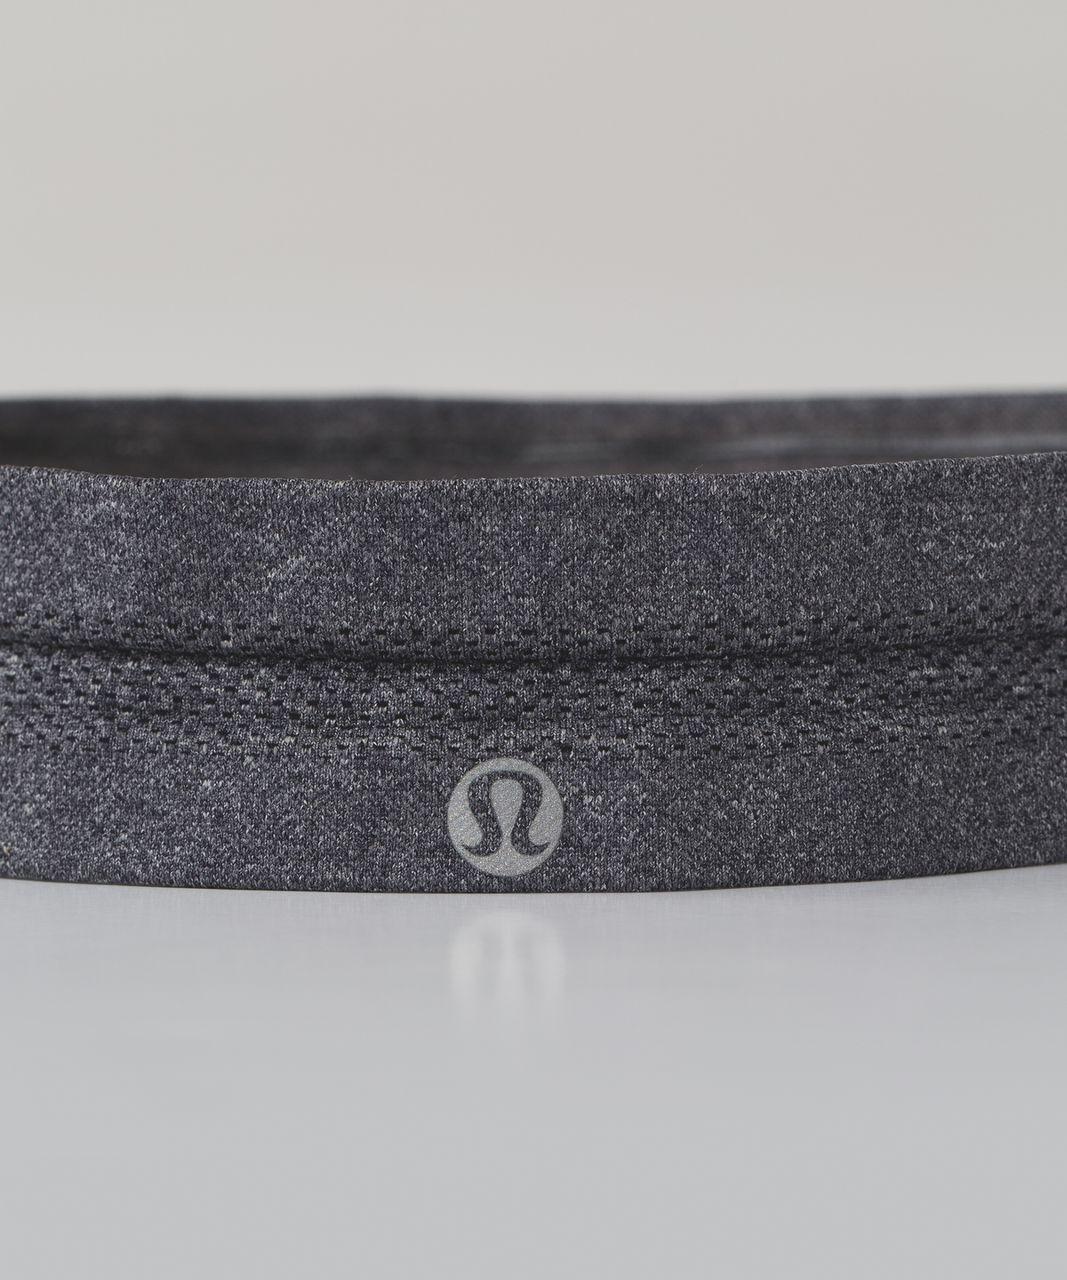 Lululemon Swiftly Headband - Heathered Black (First Release)